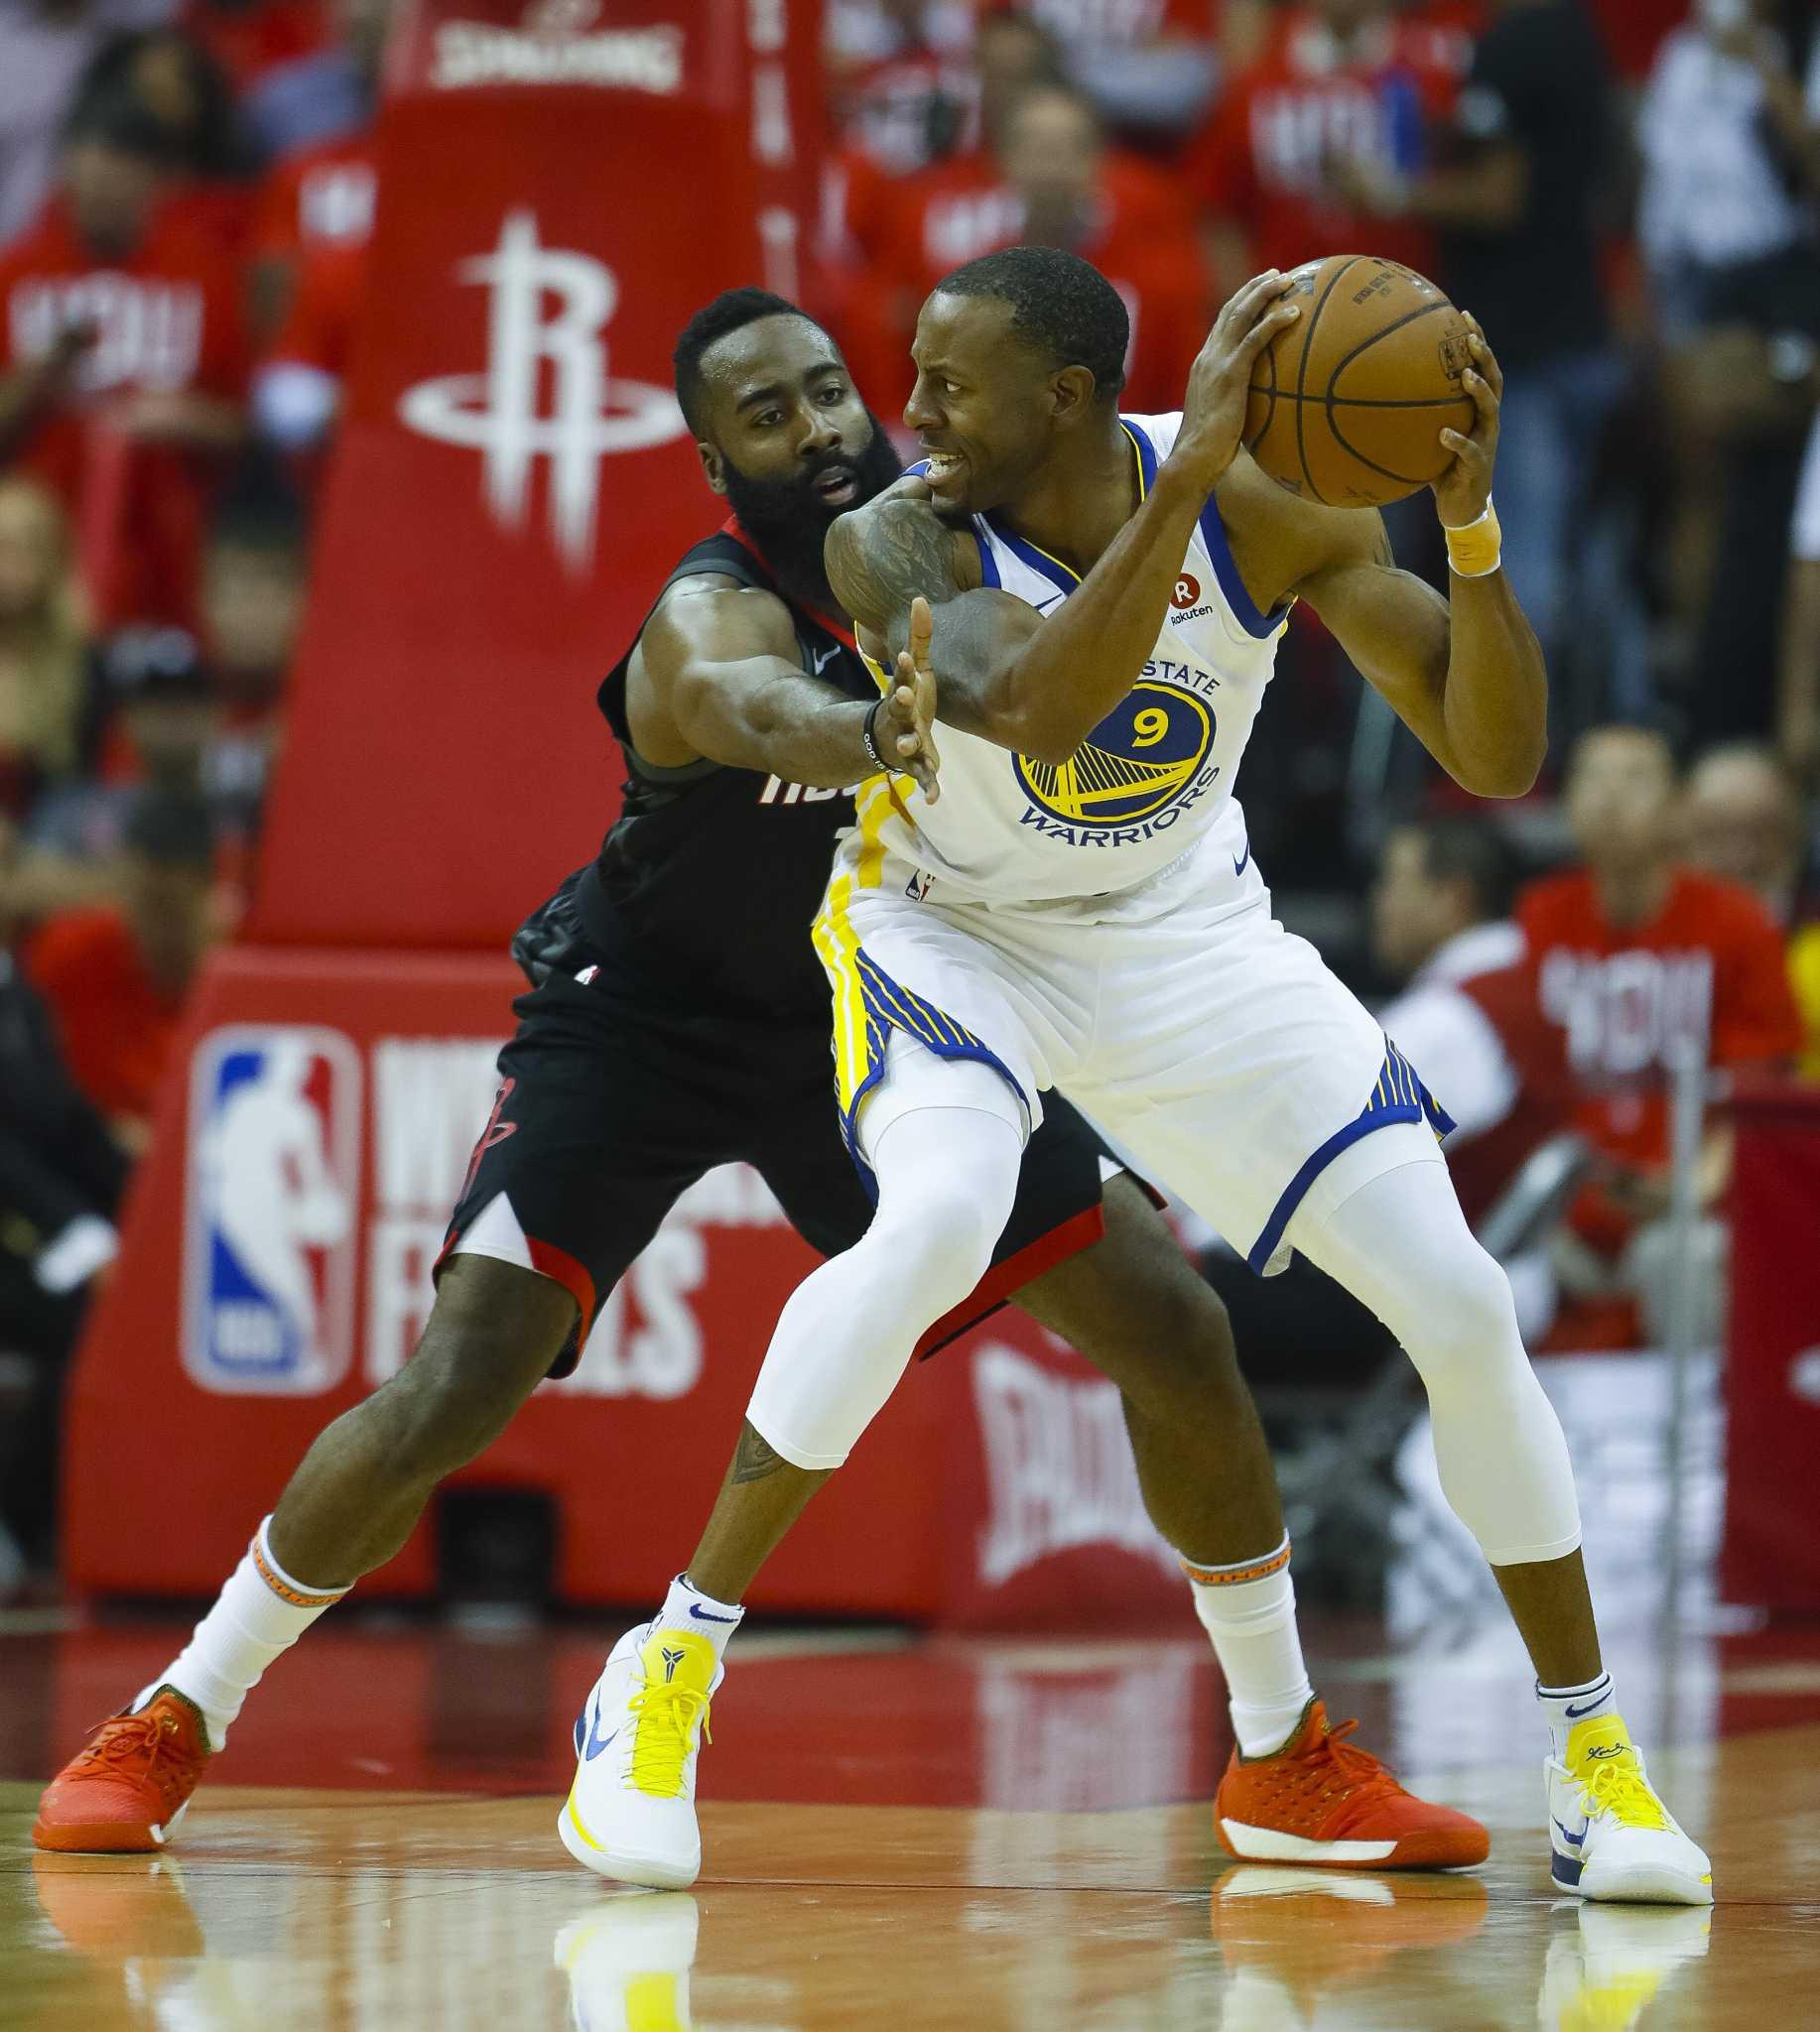 Warriors' 'Hampton 5' Lineup Creates Issues For Rockets